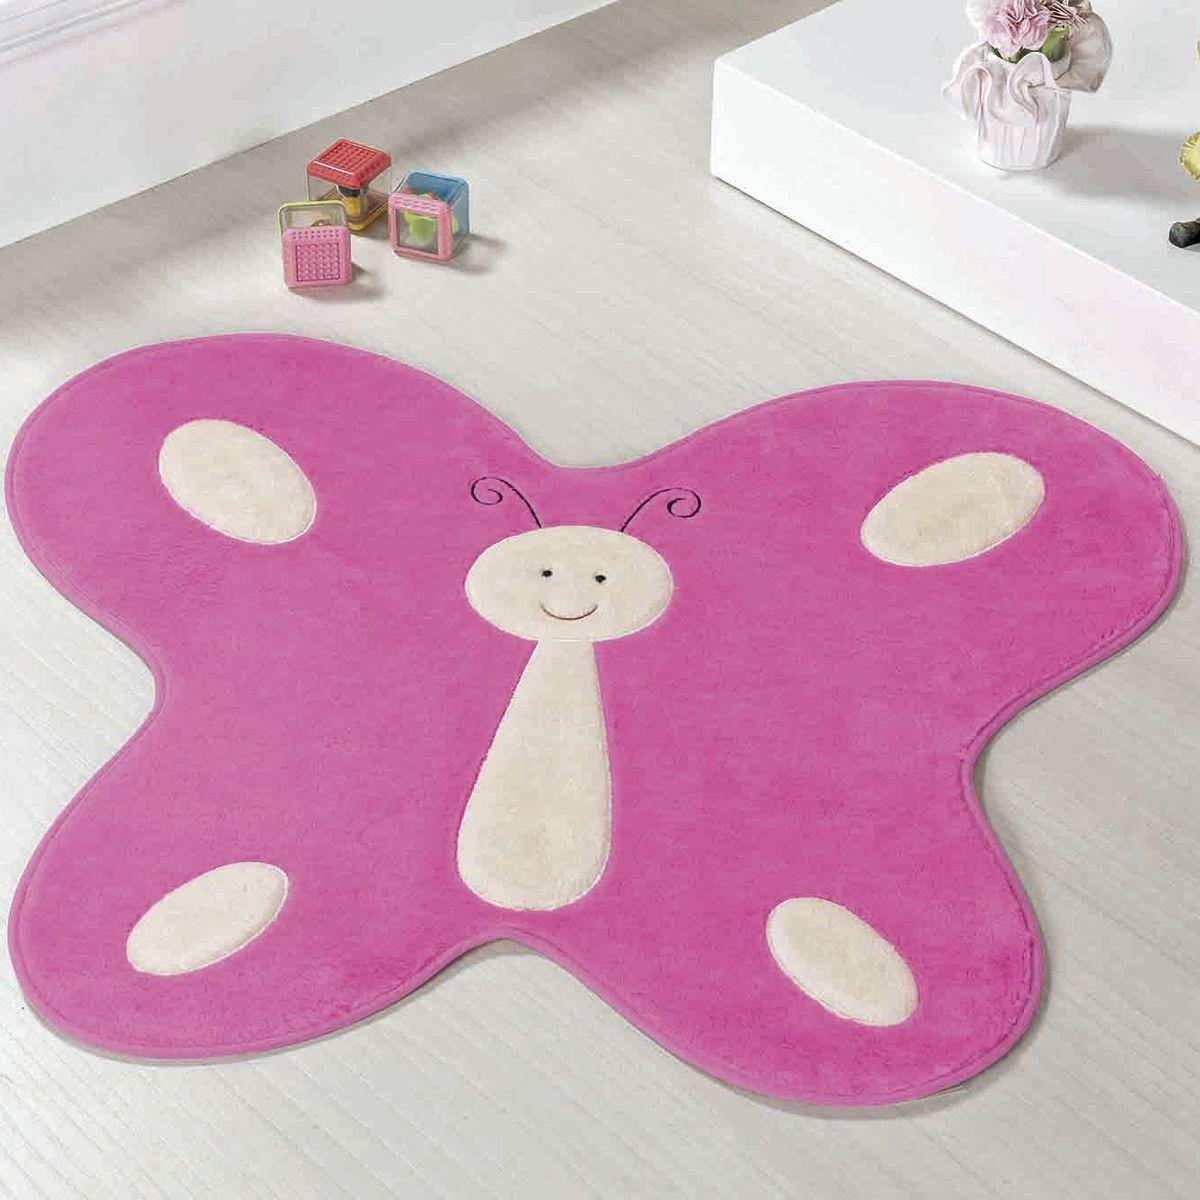 Tapete Infantil Premium Formato Borboleta Feliz Pink 80cm x 66cm